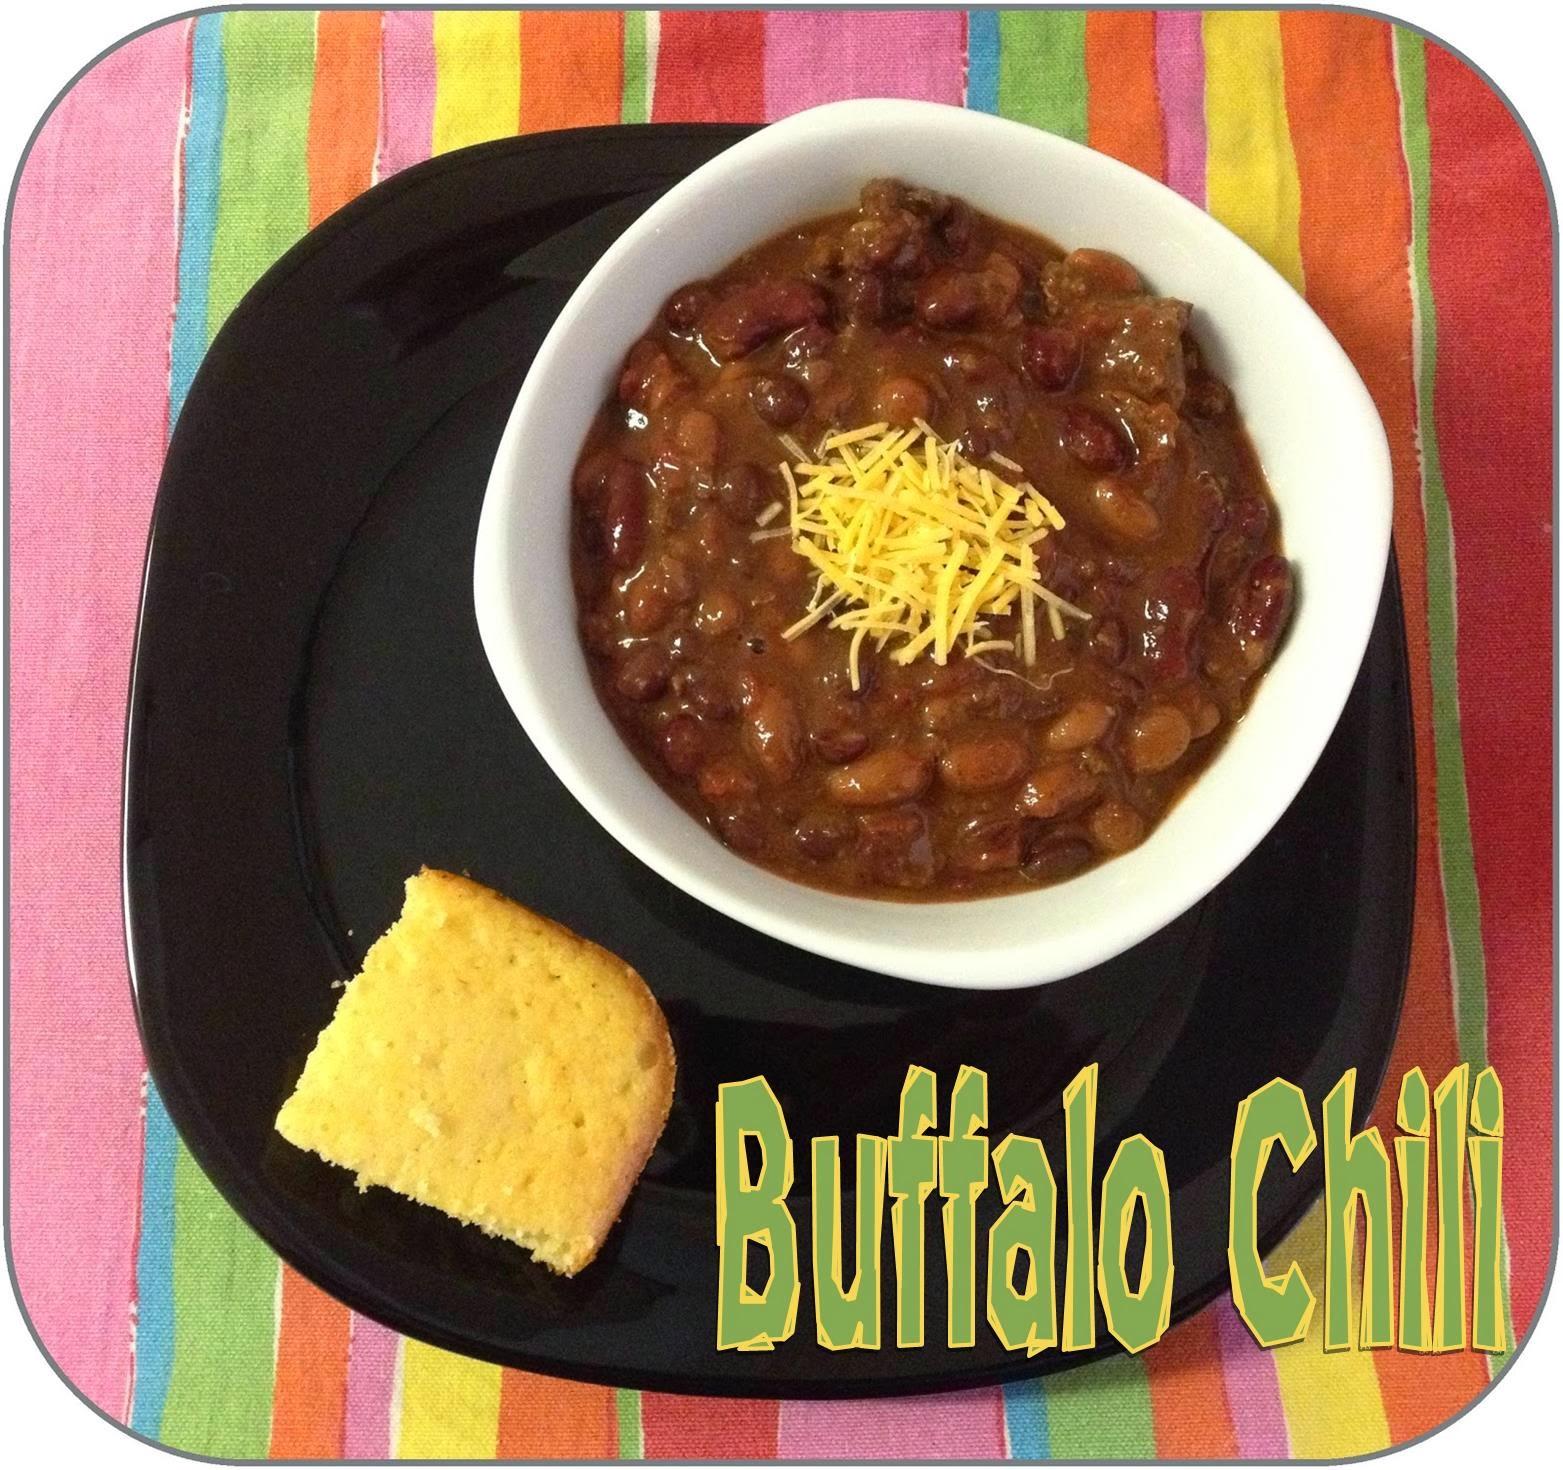 http://www.lifeinrandombits.com/2012/10/buffalo-chili-recipe.html